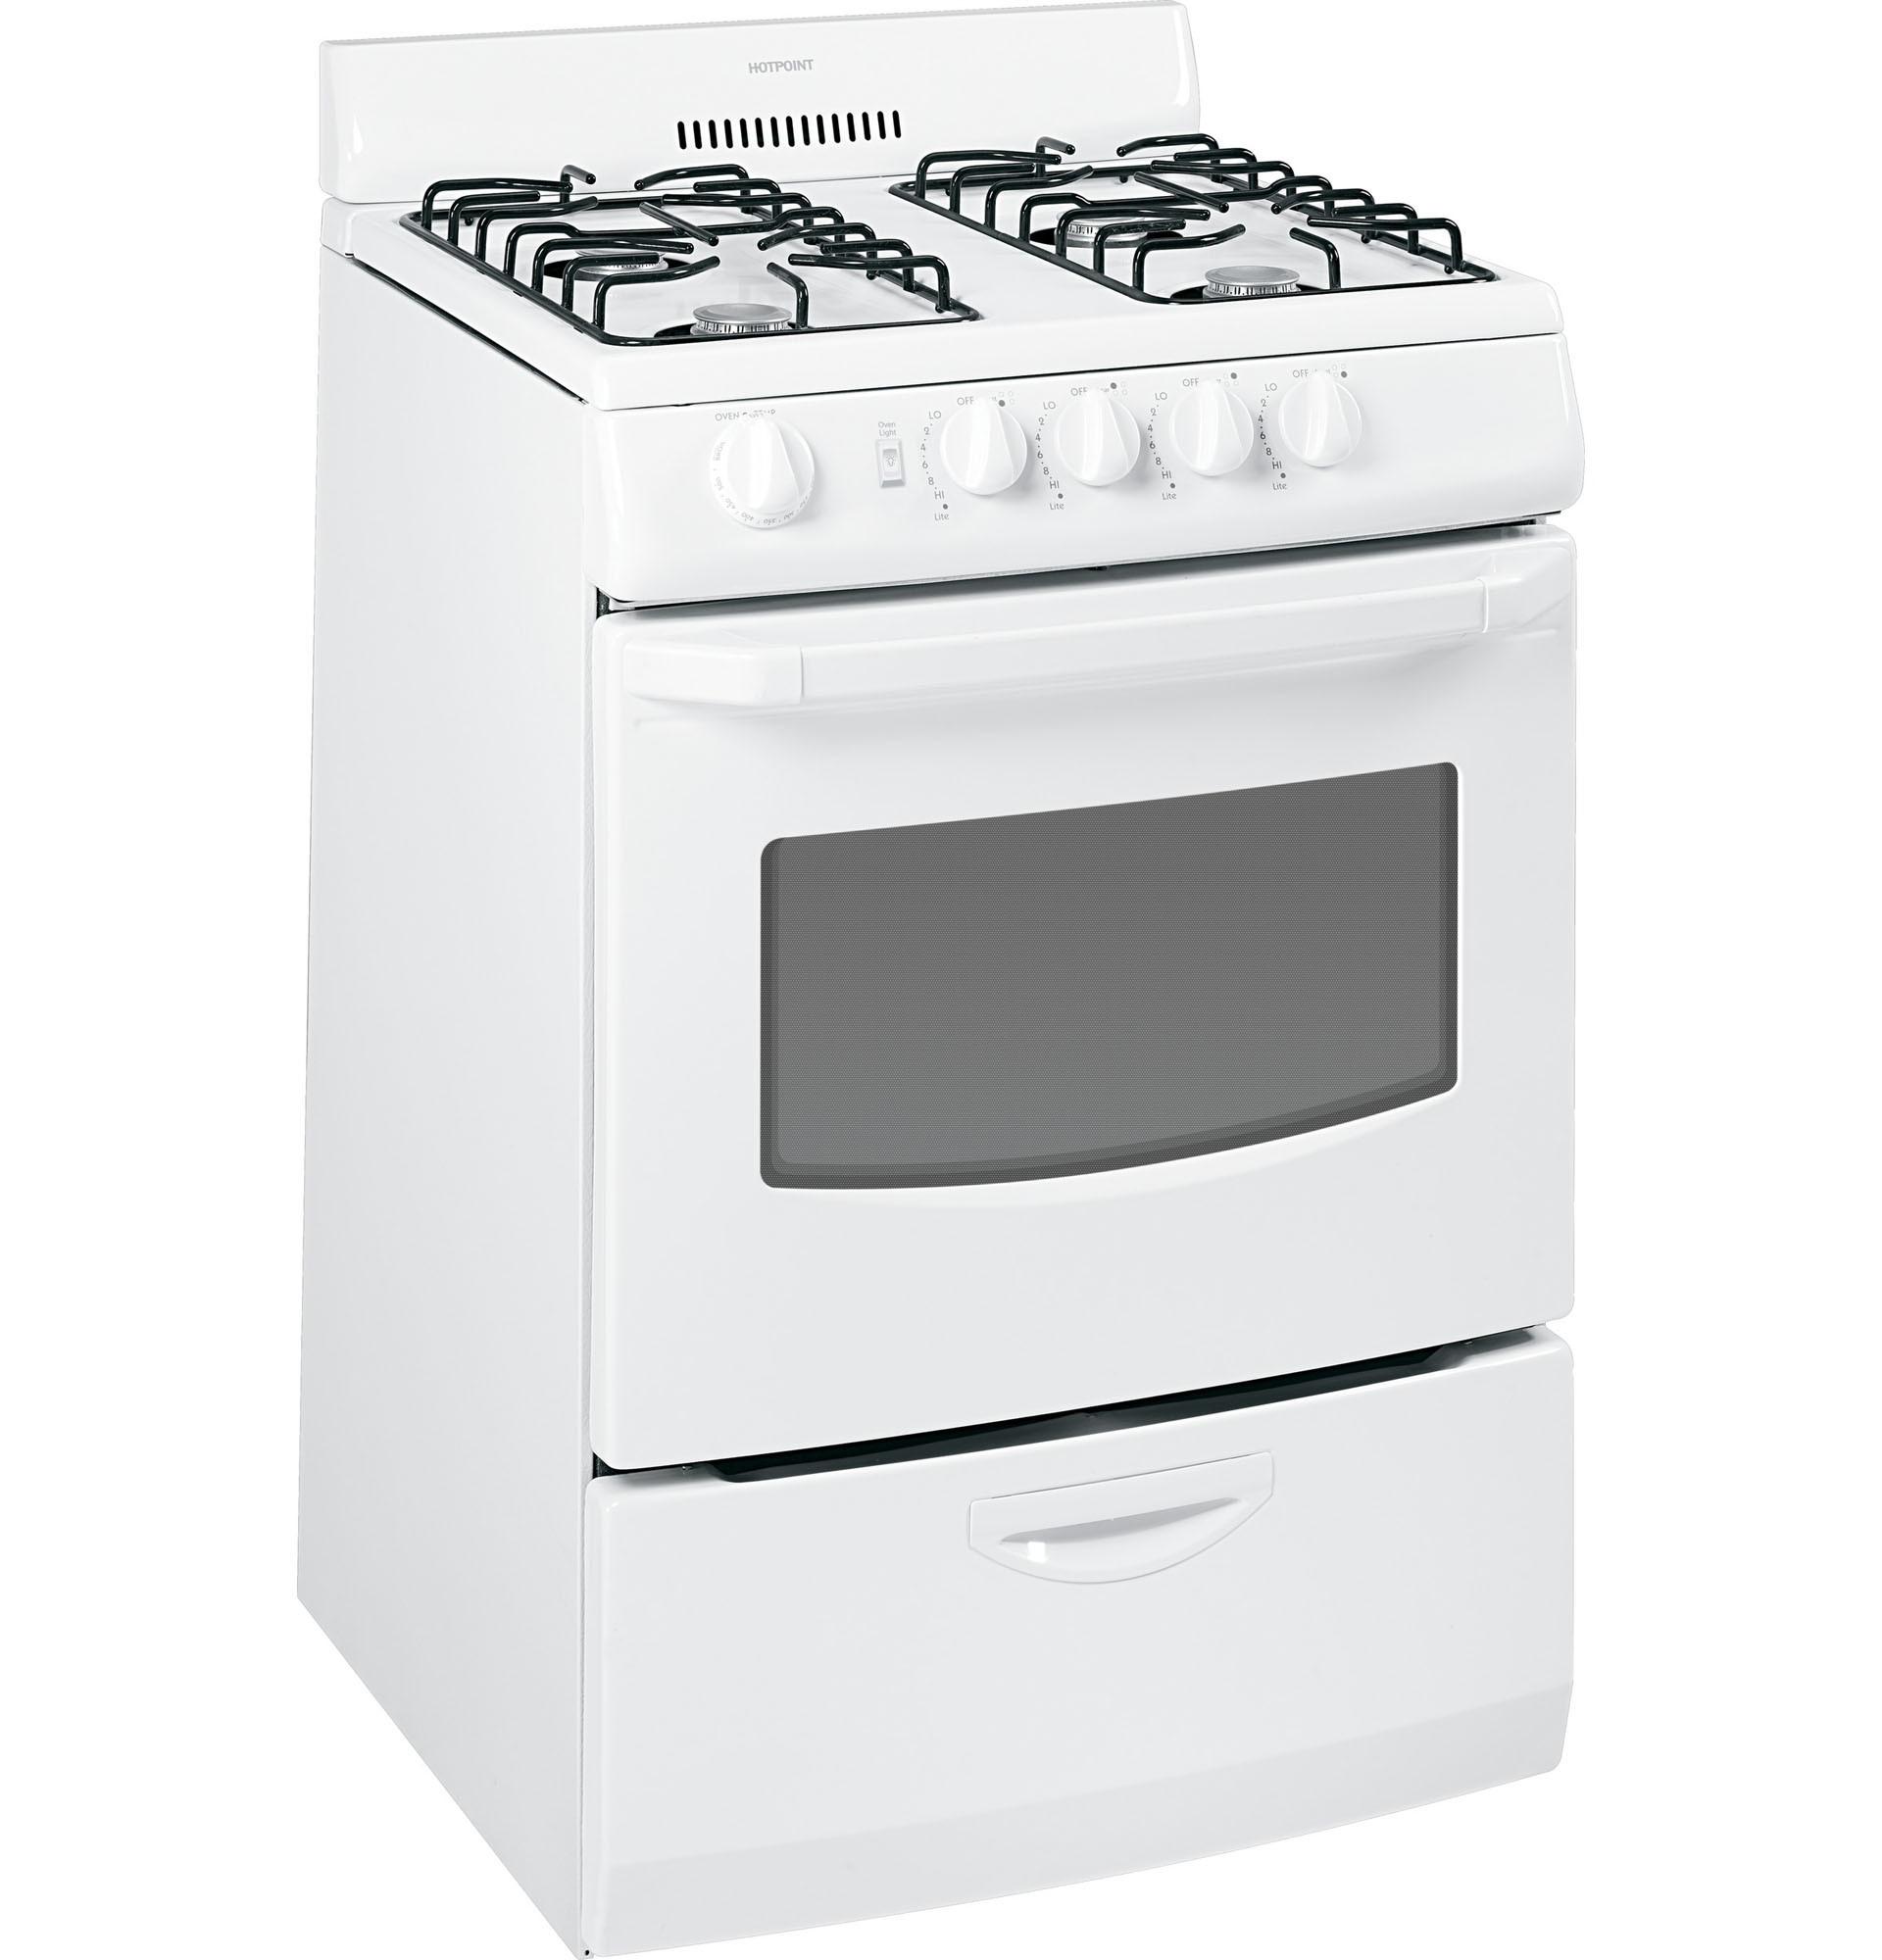 Hotpoint RGA824DEDWW 3.0 cu. ft. Freestanding Gas Range - White